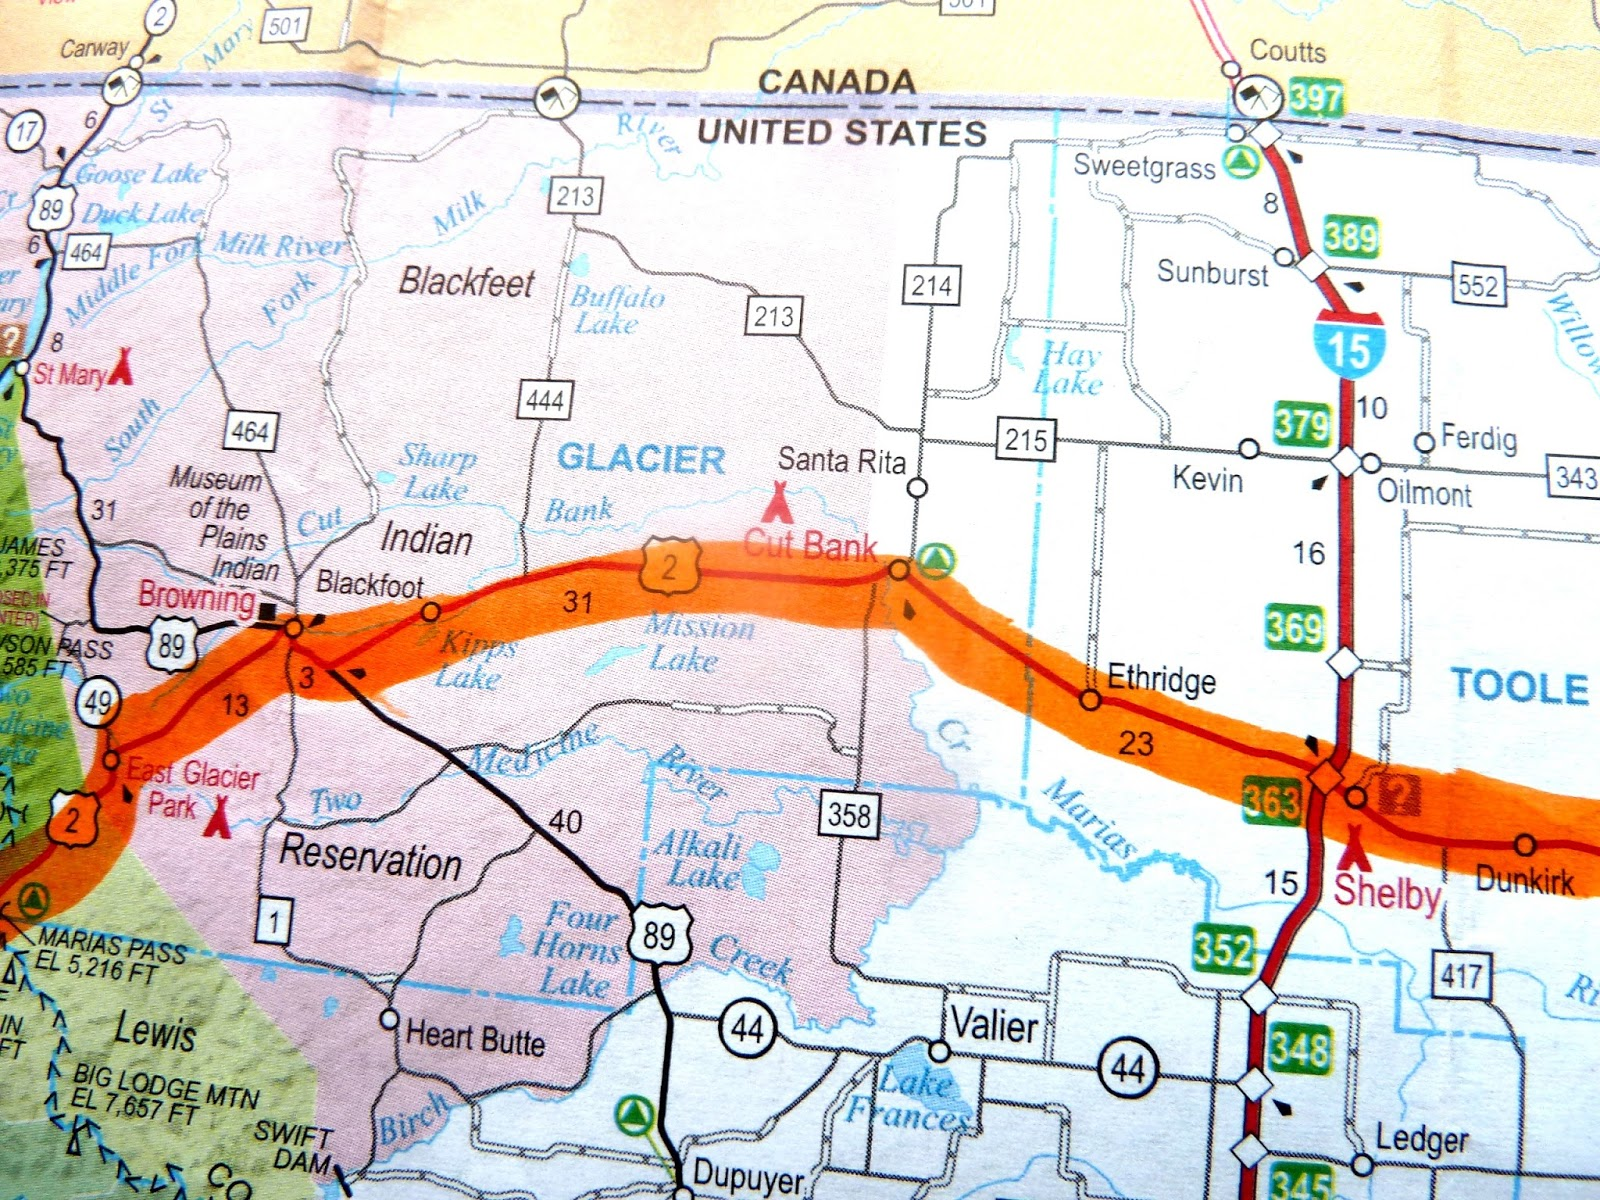 FileUS Route Business Uniontown PA Mapsvg Wikimedia Best Image - Us route 89 map